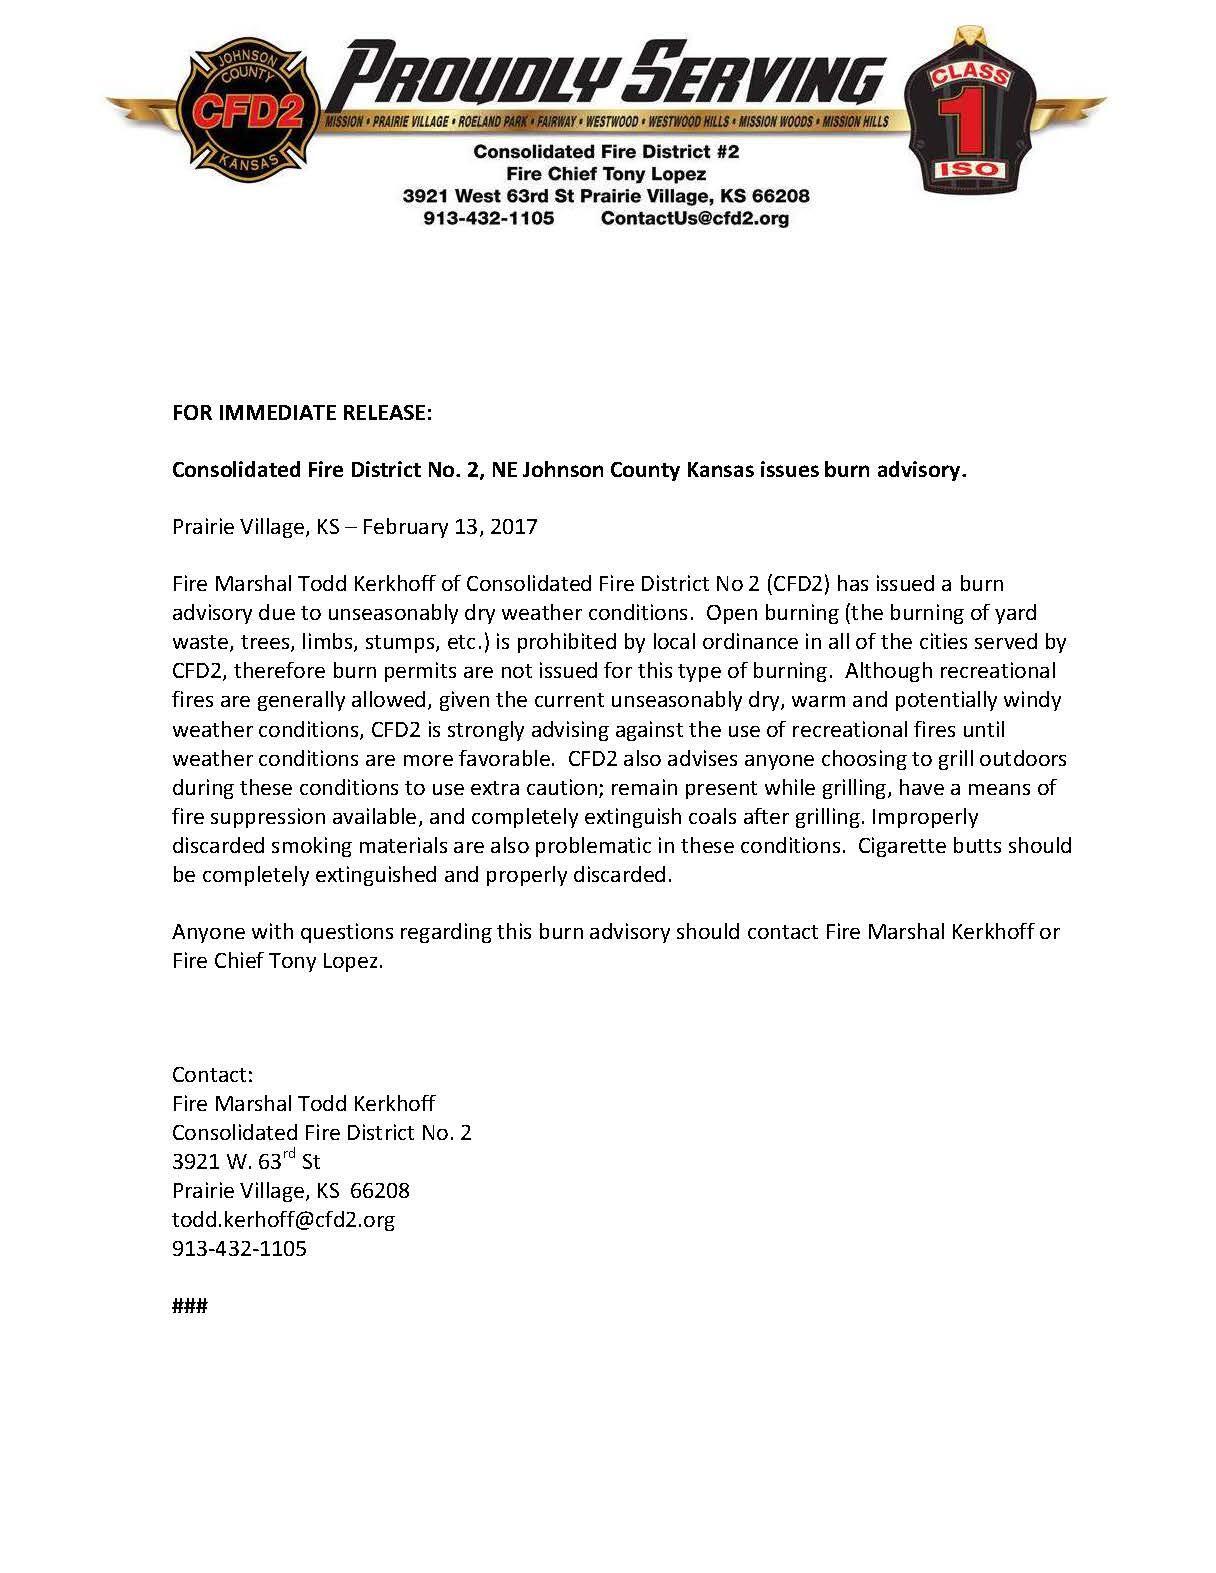 Kansas johnson county prairie village - Cfd2 Issues Burn Advisory Johnson County Consolidated Fire District 2 Nextdoor